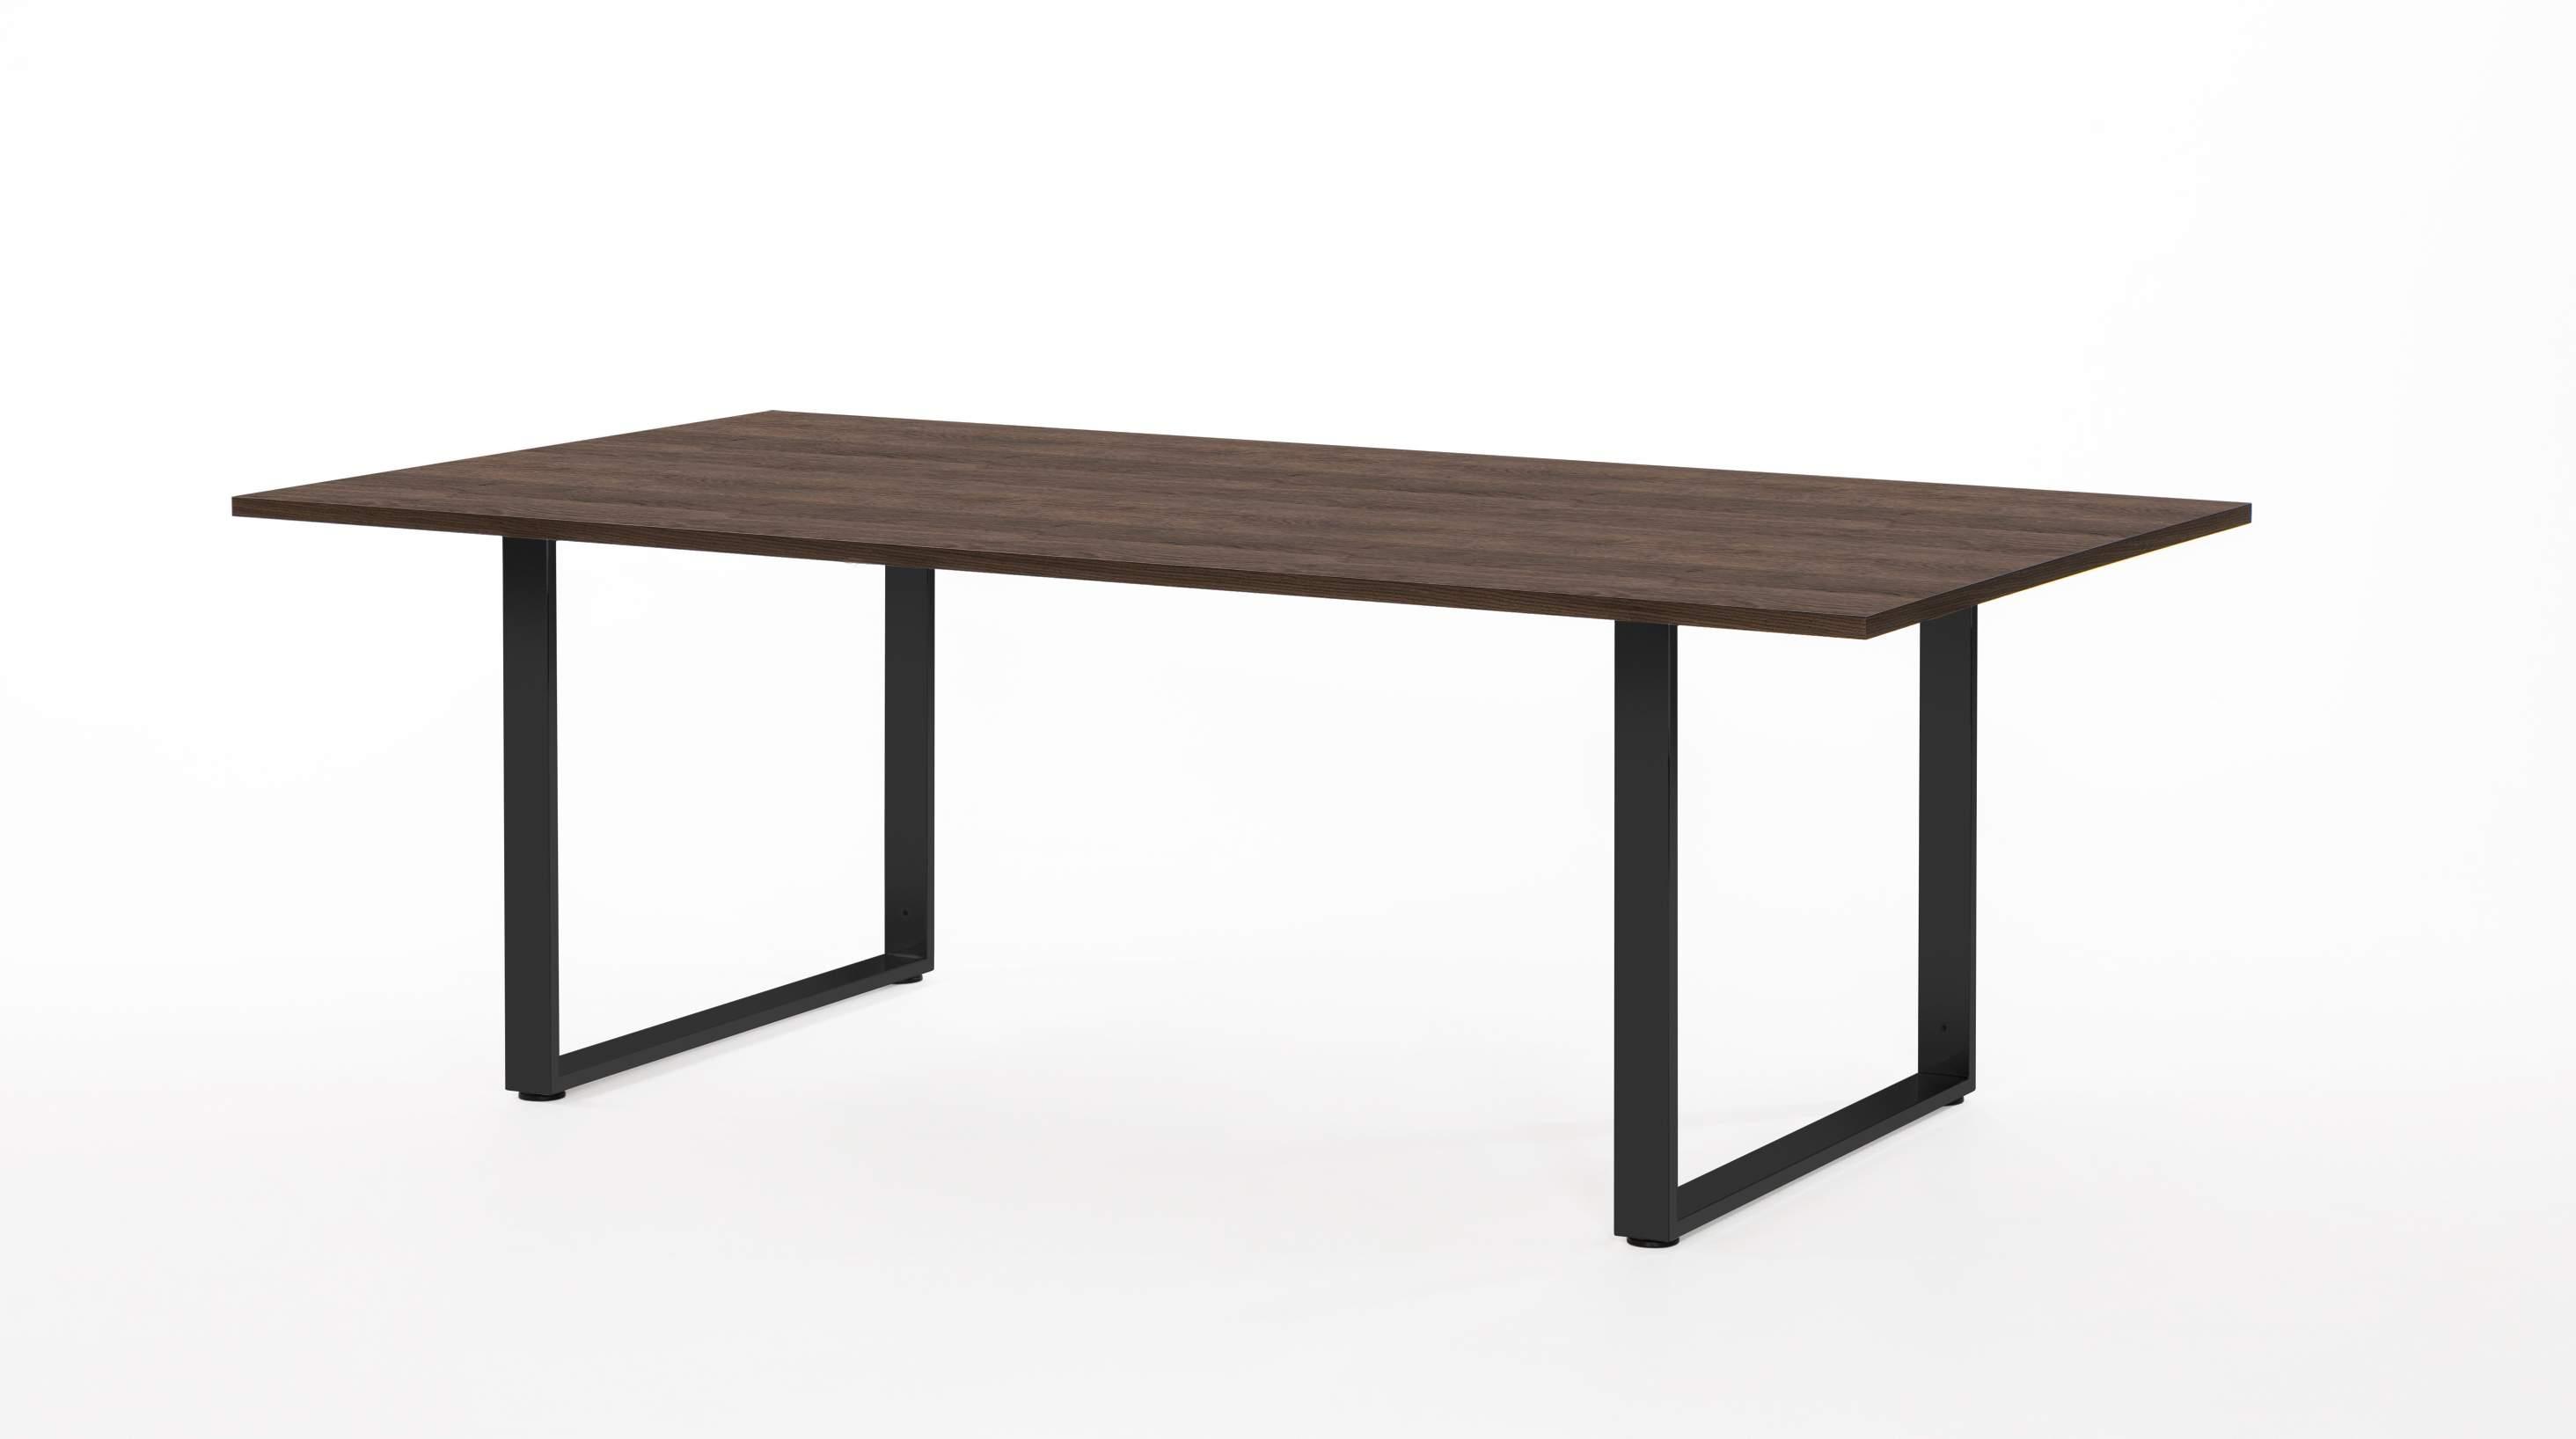 Стол для переговоров с черными опорами 2400x1200x770